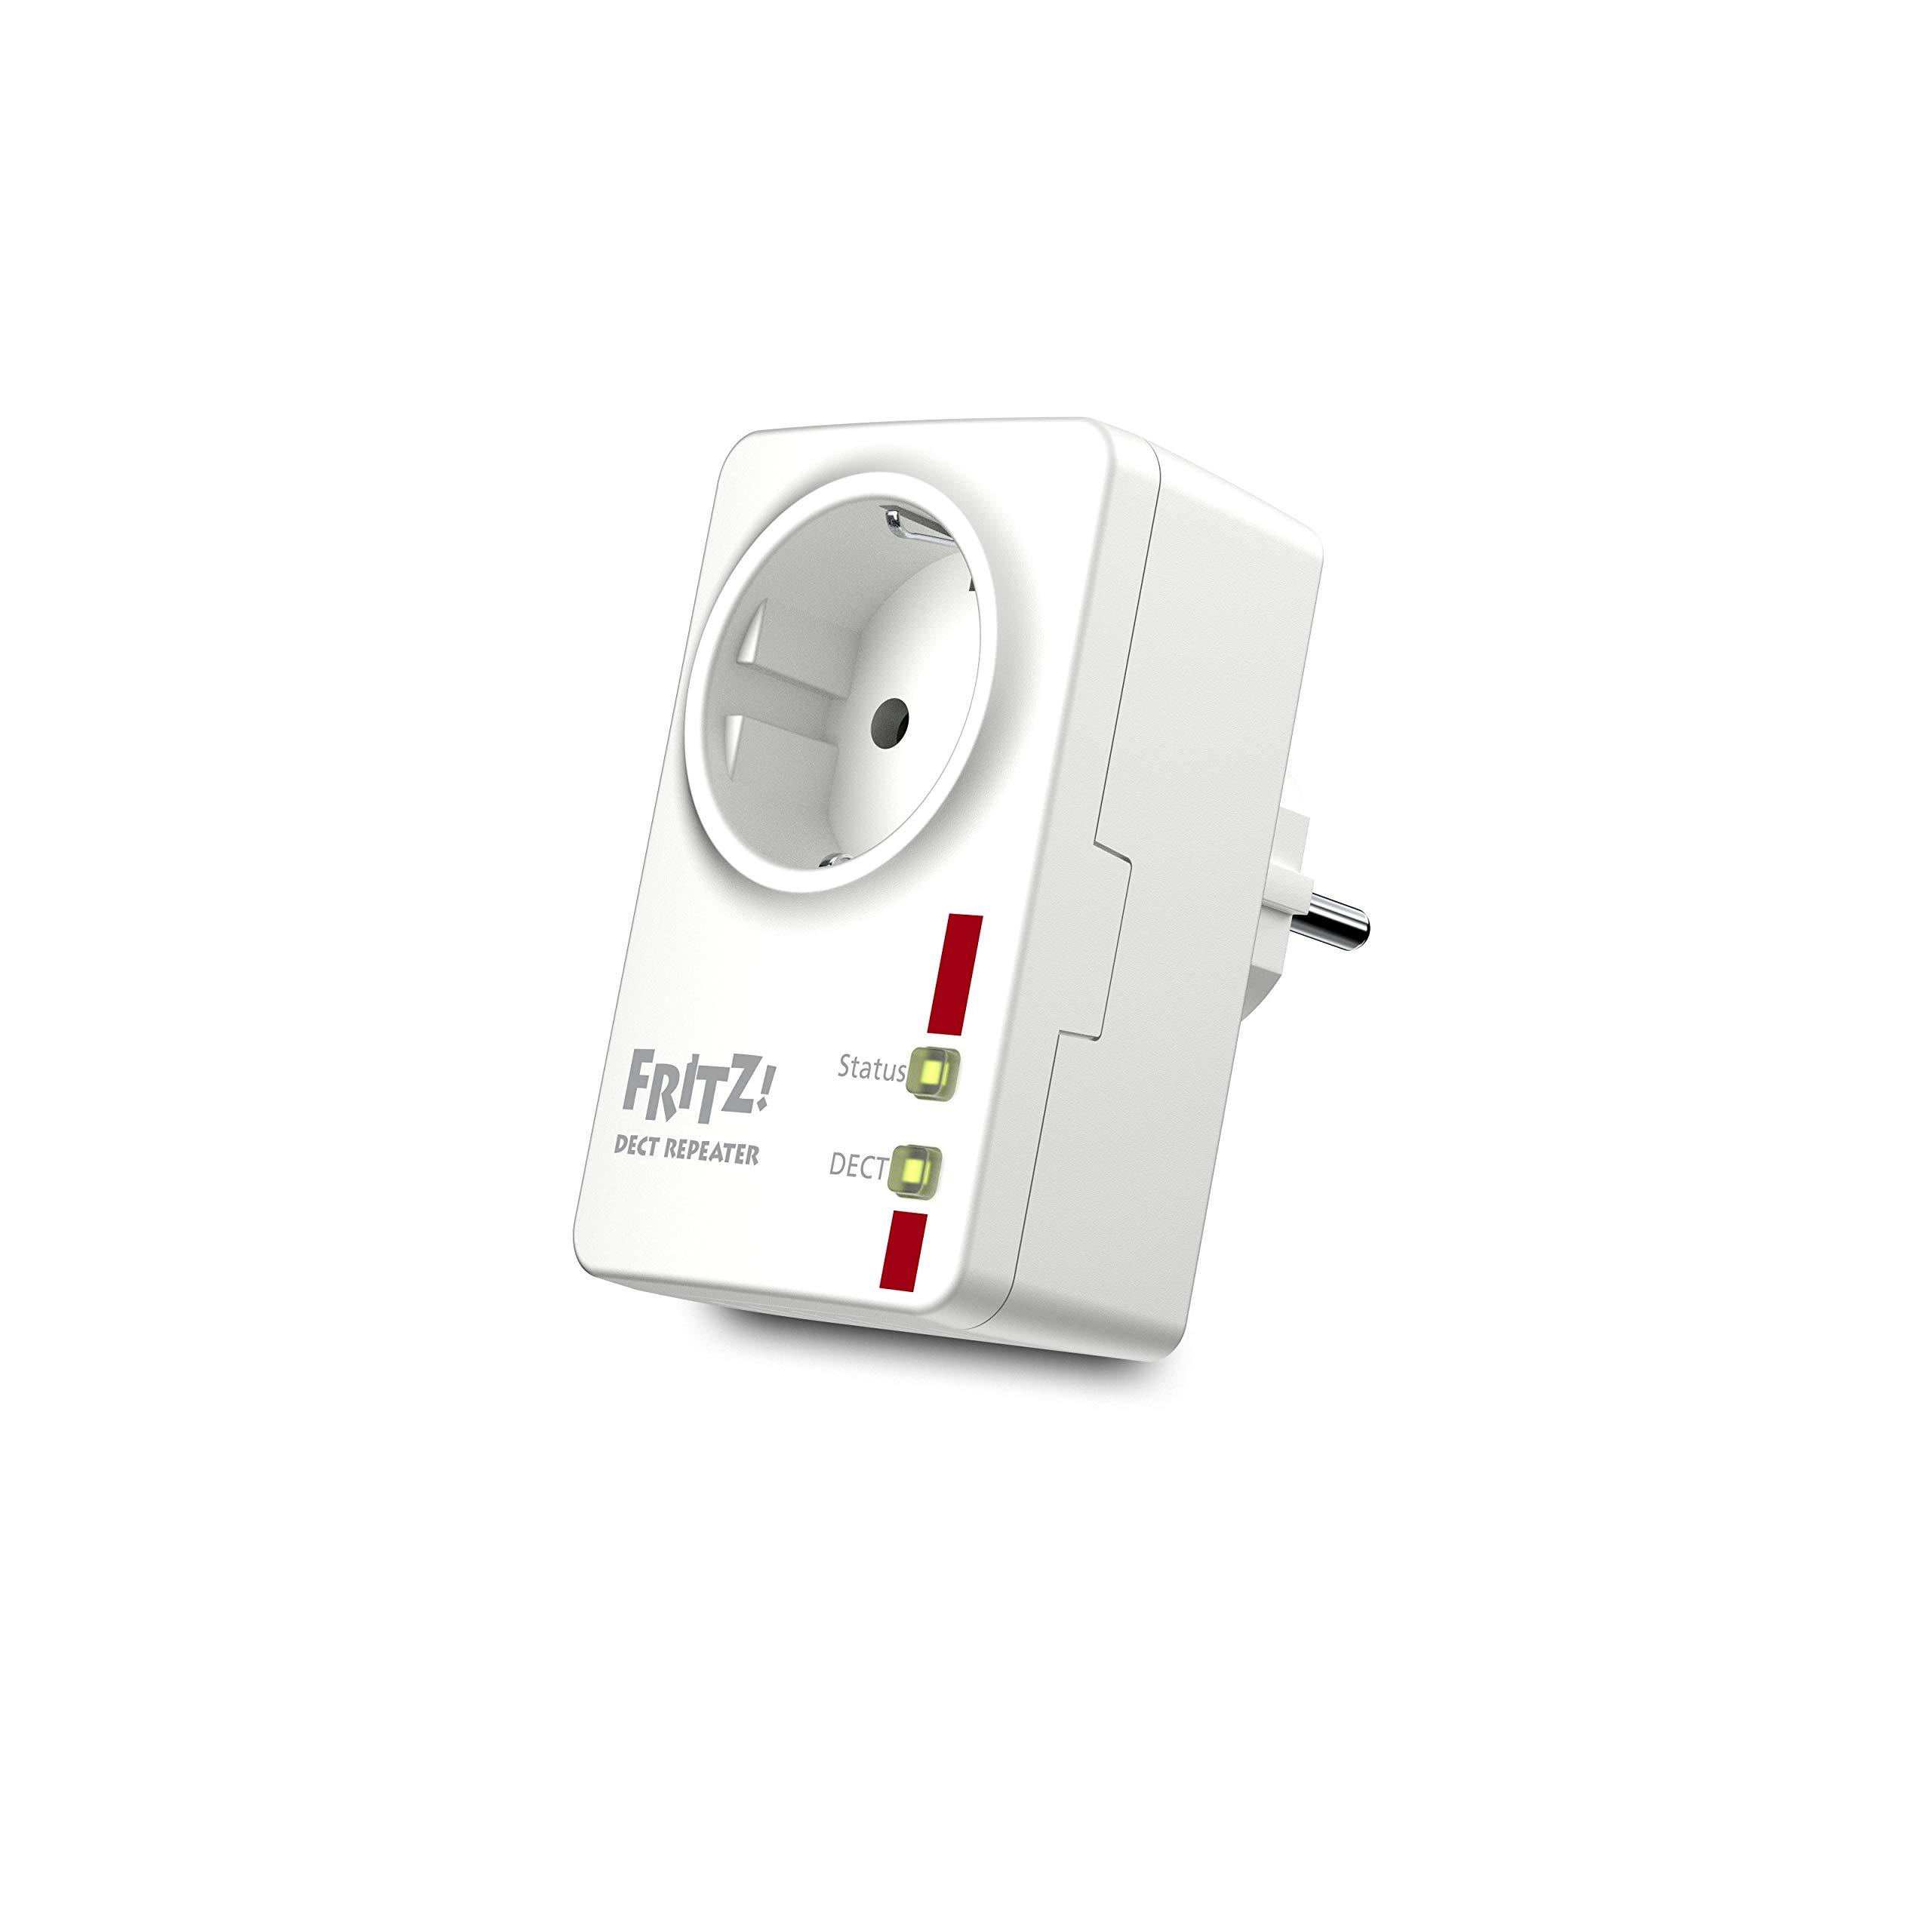 AVM FRITZ!Box 6490 Cable WLAN AC + N Router (DOCSIS-3.0-Kabelmodem für Kabelanschluss, bis 1.300 Mbit/s (5 GHz) VoIP…